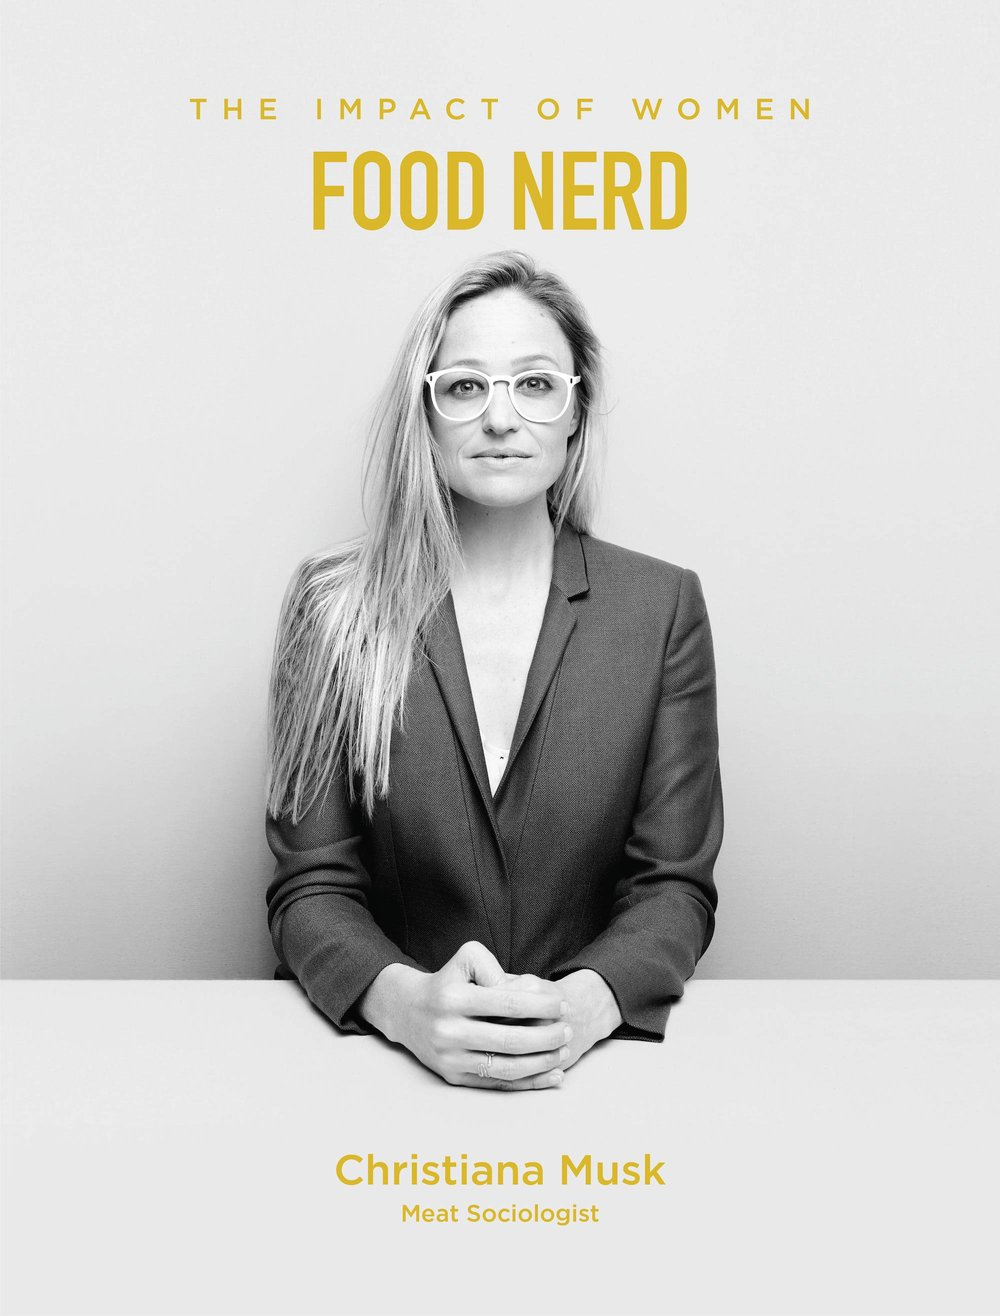 Christiana Musk is a Food Nerd